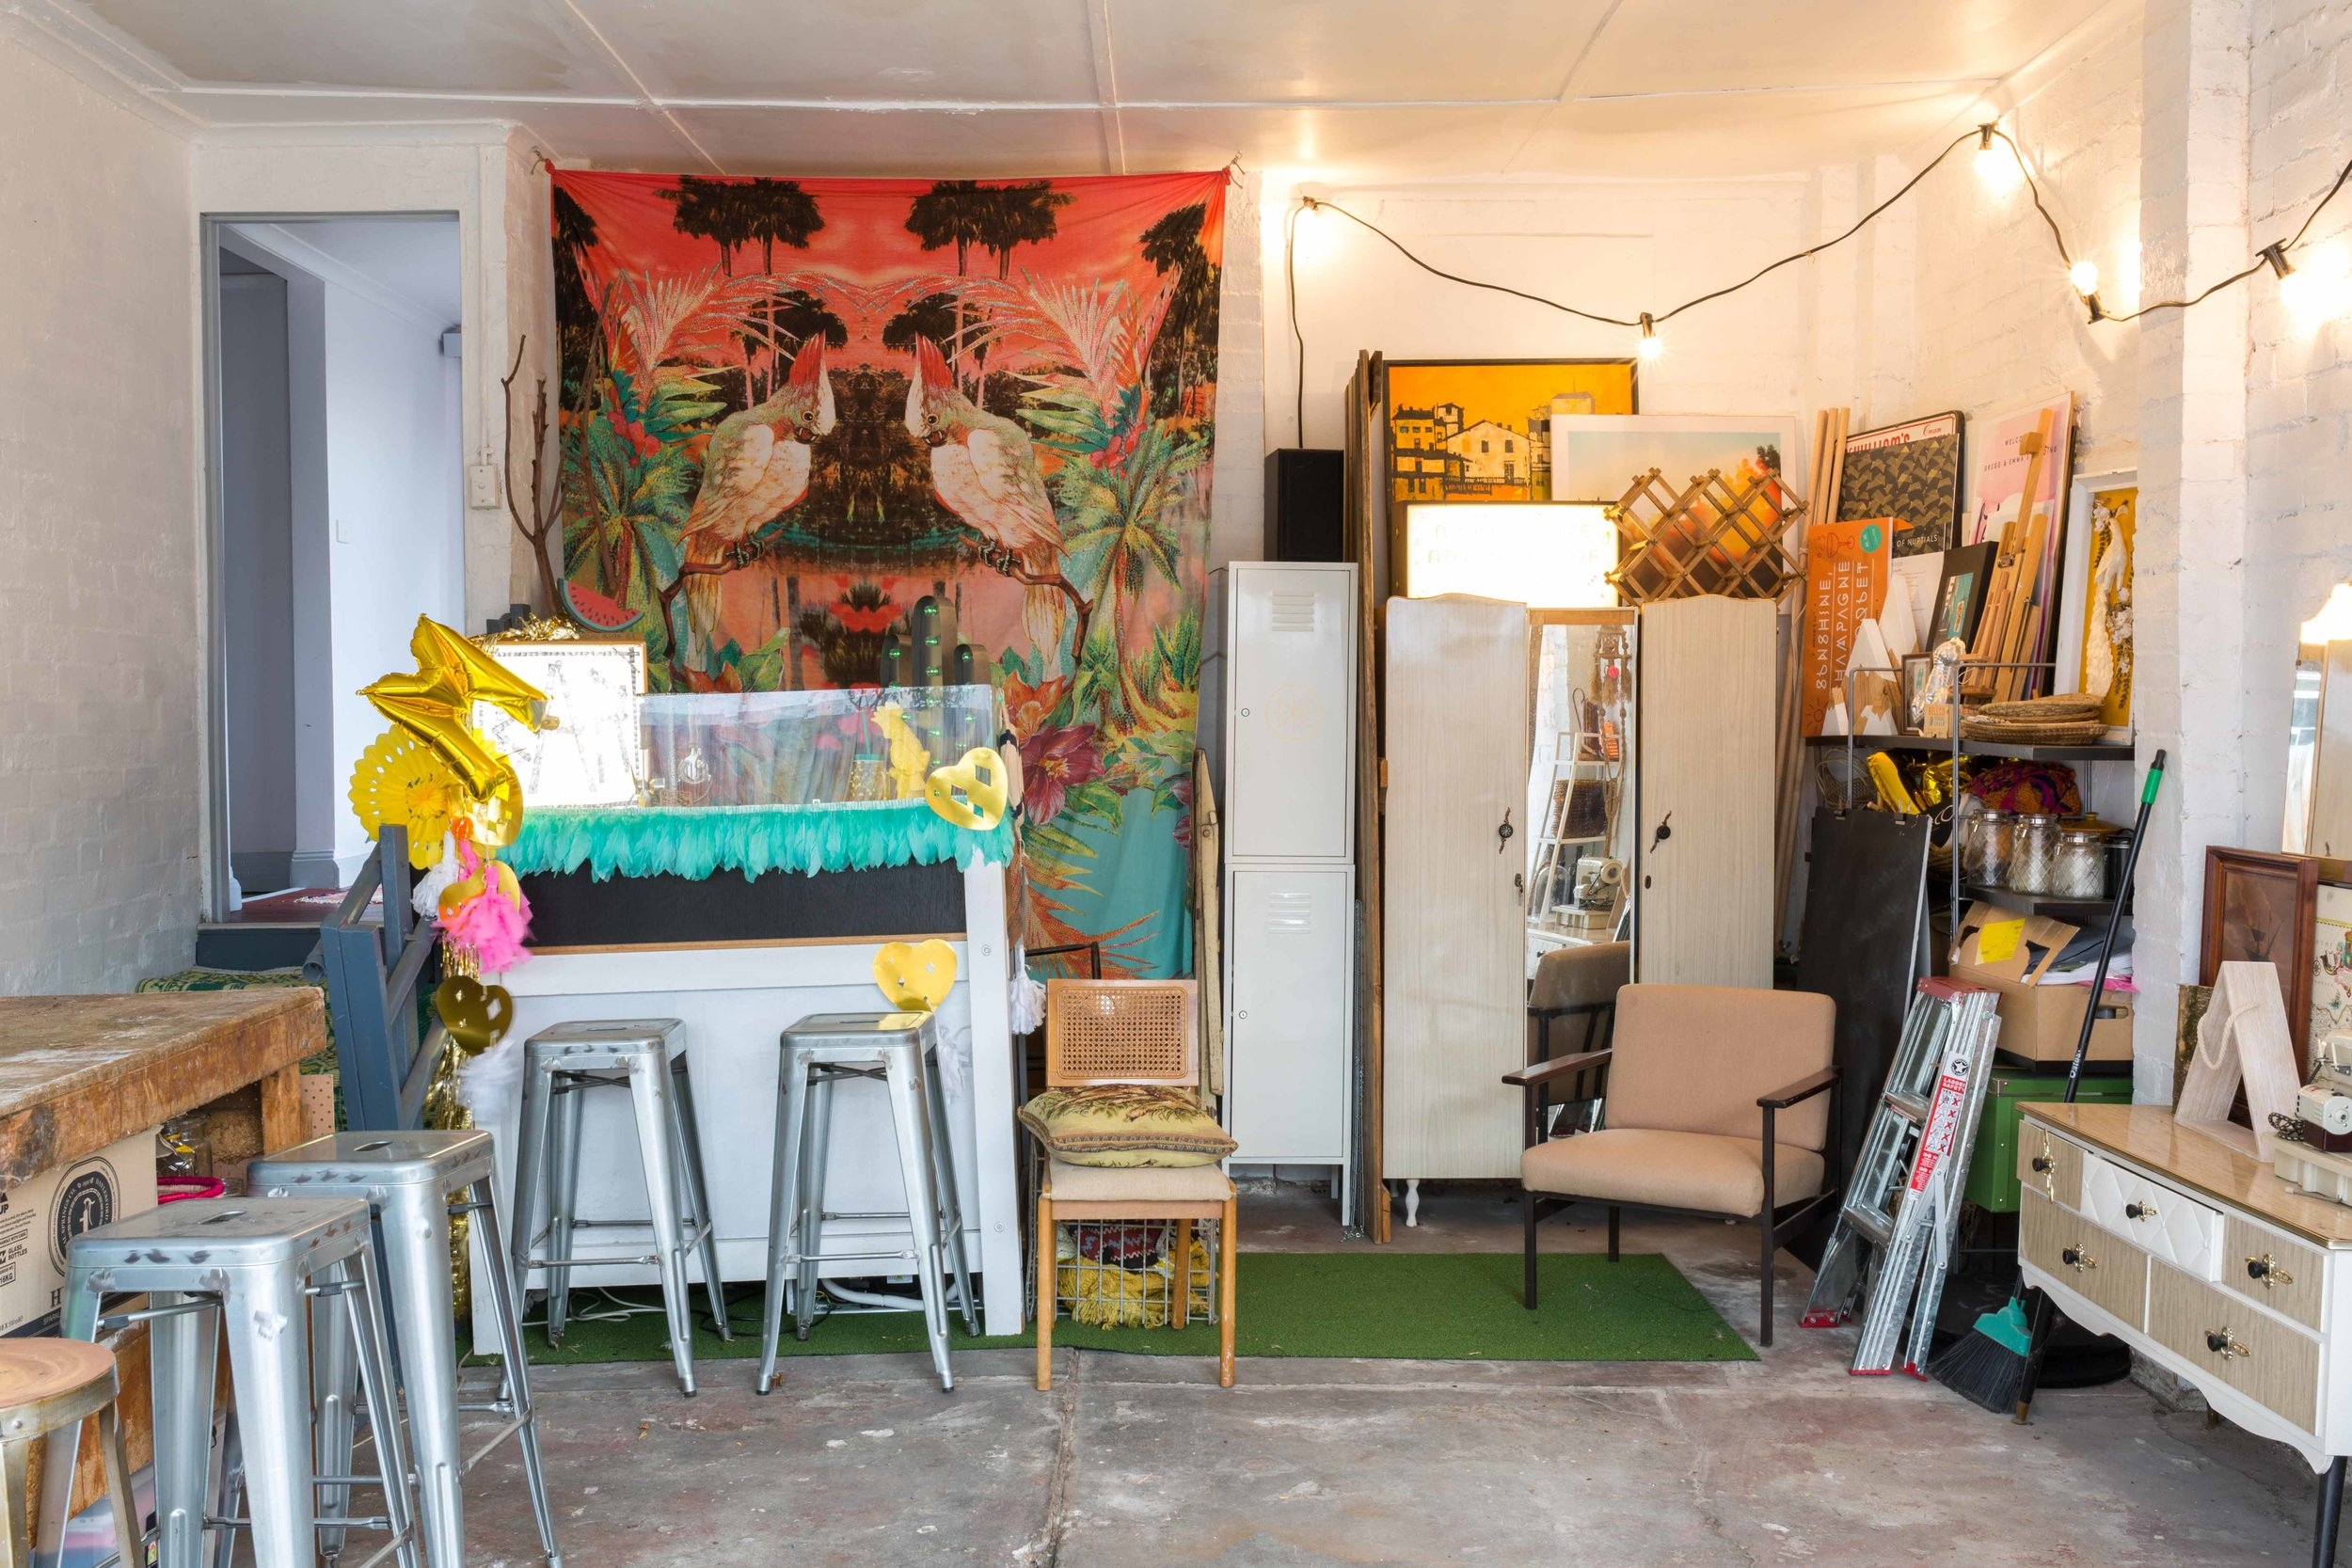 Miriam and Hamish McWilliam's garage bar - Rented Space